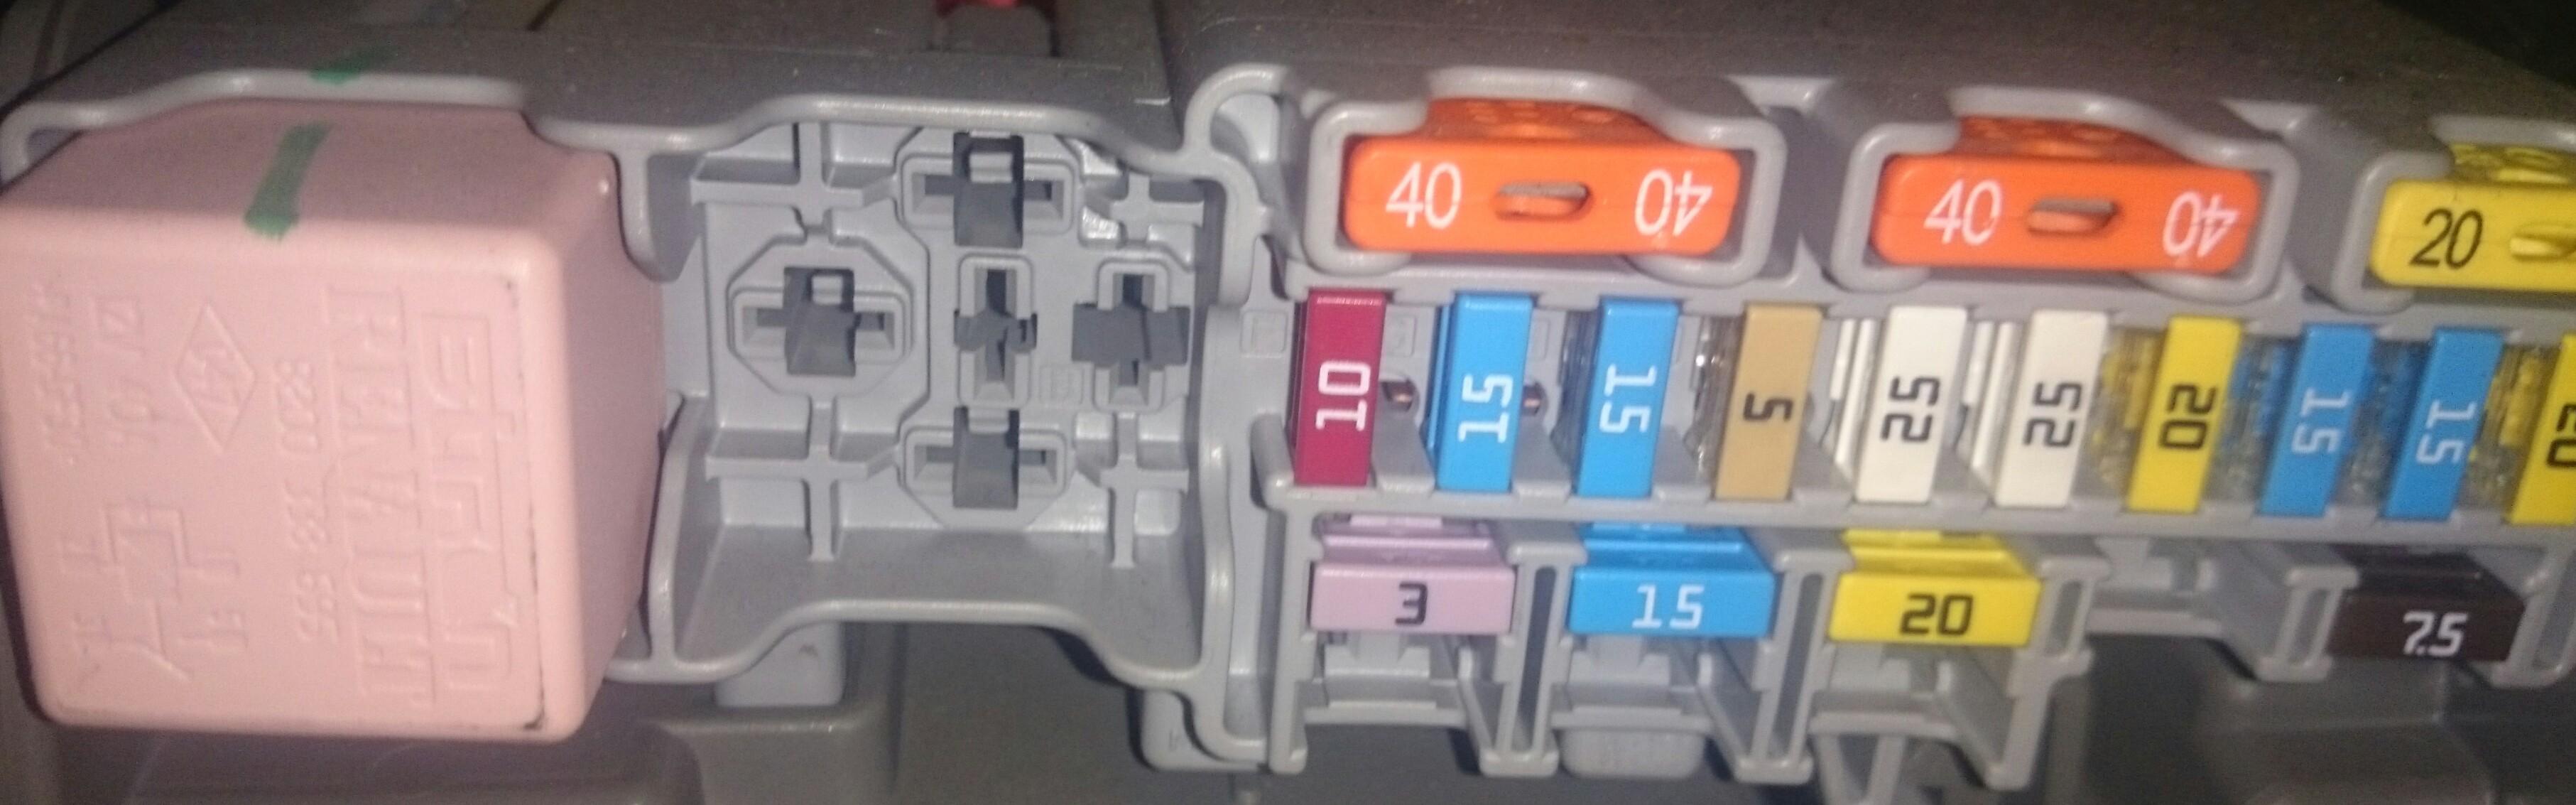 Renault Clio Mk1 Fuse Box Location Free Wiring Diagram For You X Reg Library Rh 49 Evitta De Mk2